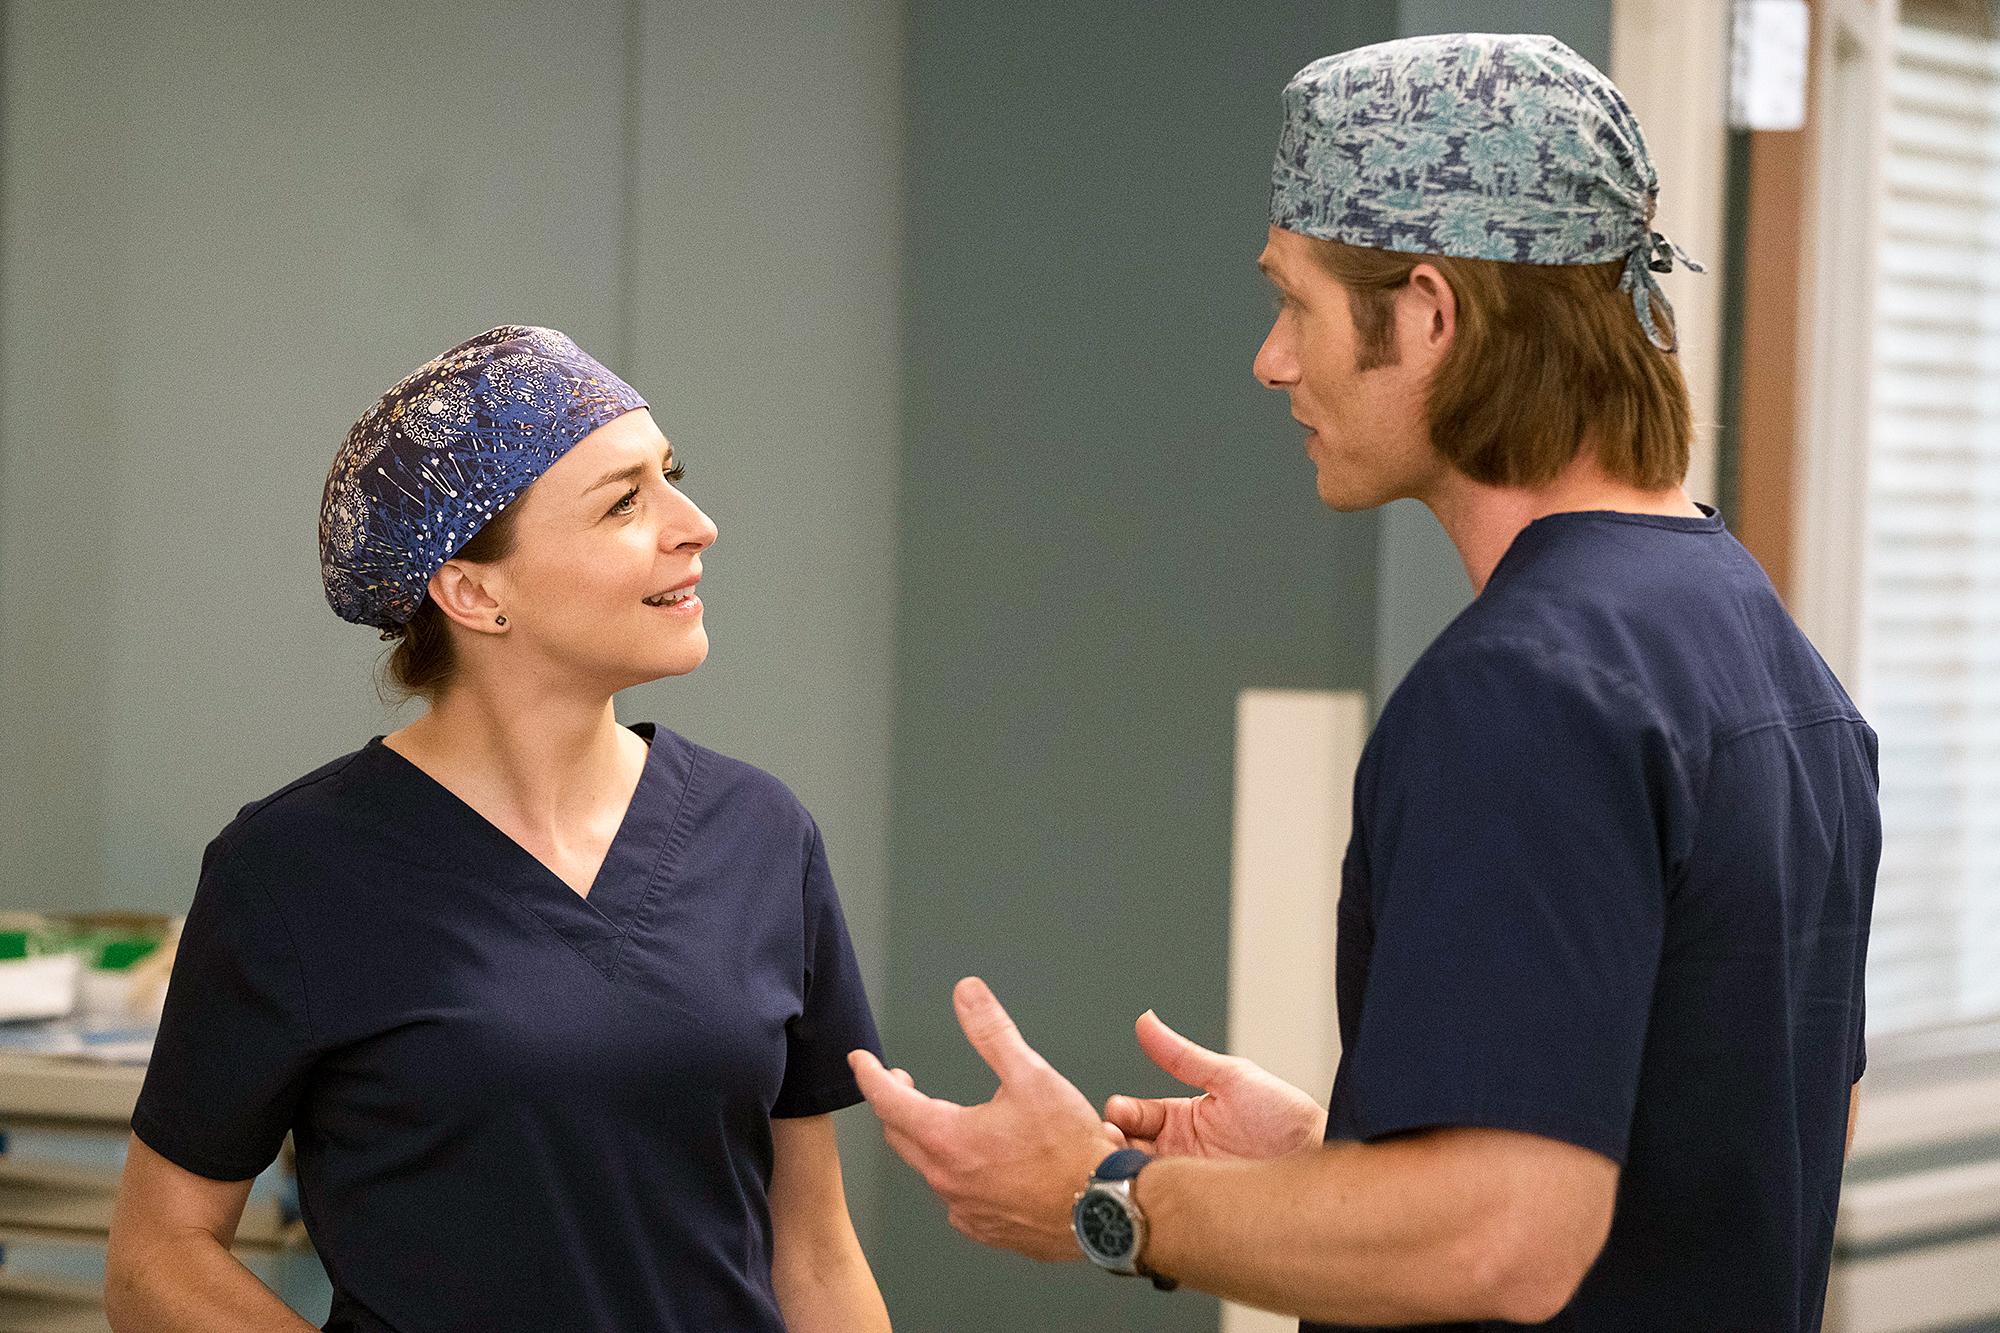 Amelia Dr. Link Grey's Anatomy - Caterina Scorsone as Amelia and Chris Carmack as Dr. Link on 'Grey's Anatomy.